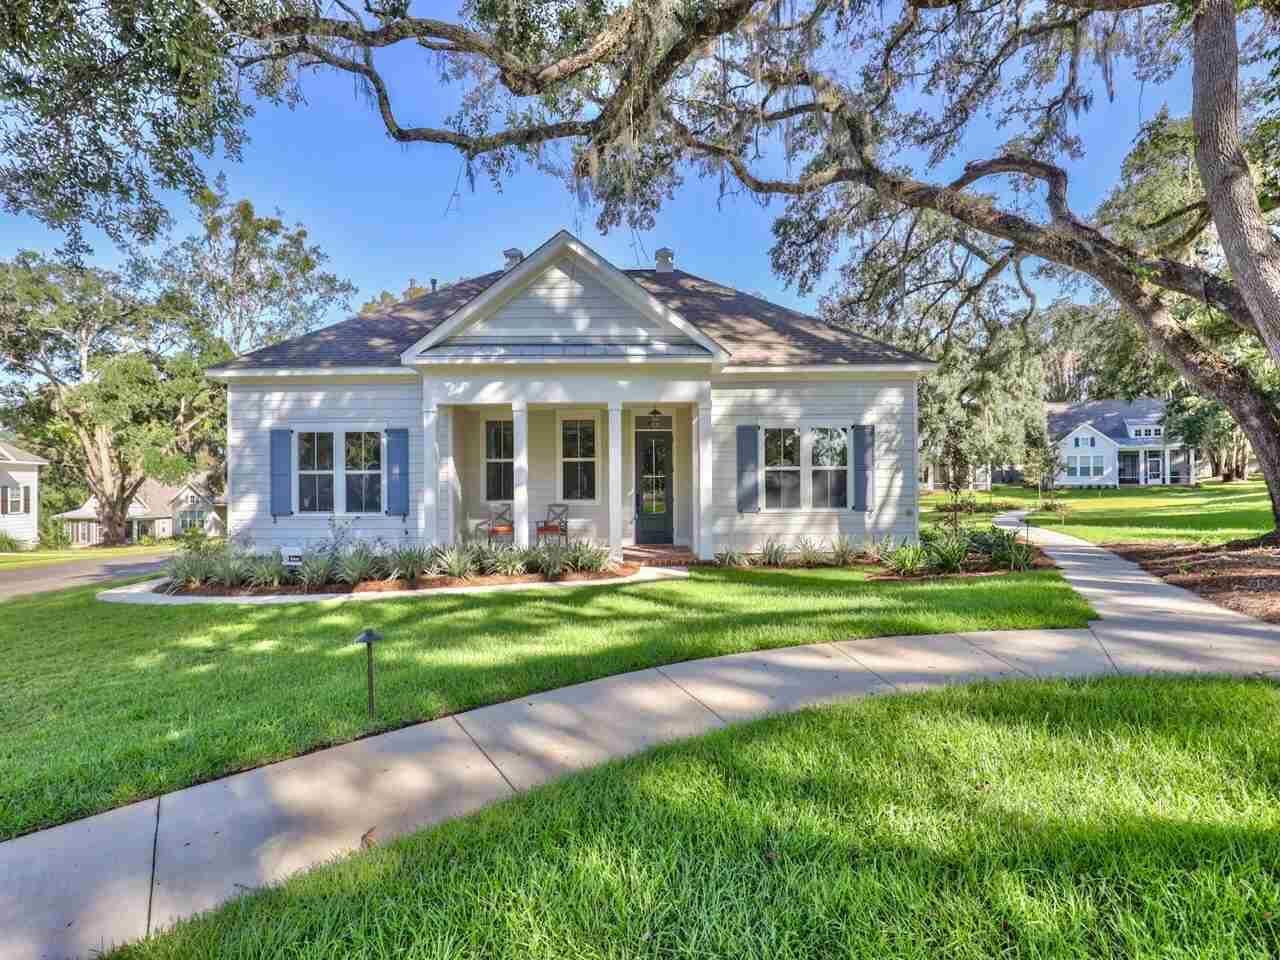 241 Camellia Oaks Avenue, Tallahassee, FL 32317 - MLS#: 322455